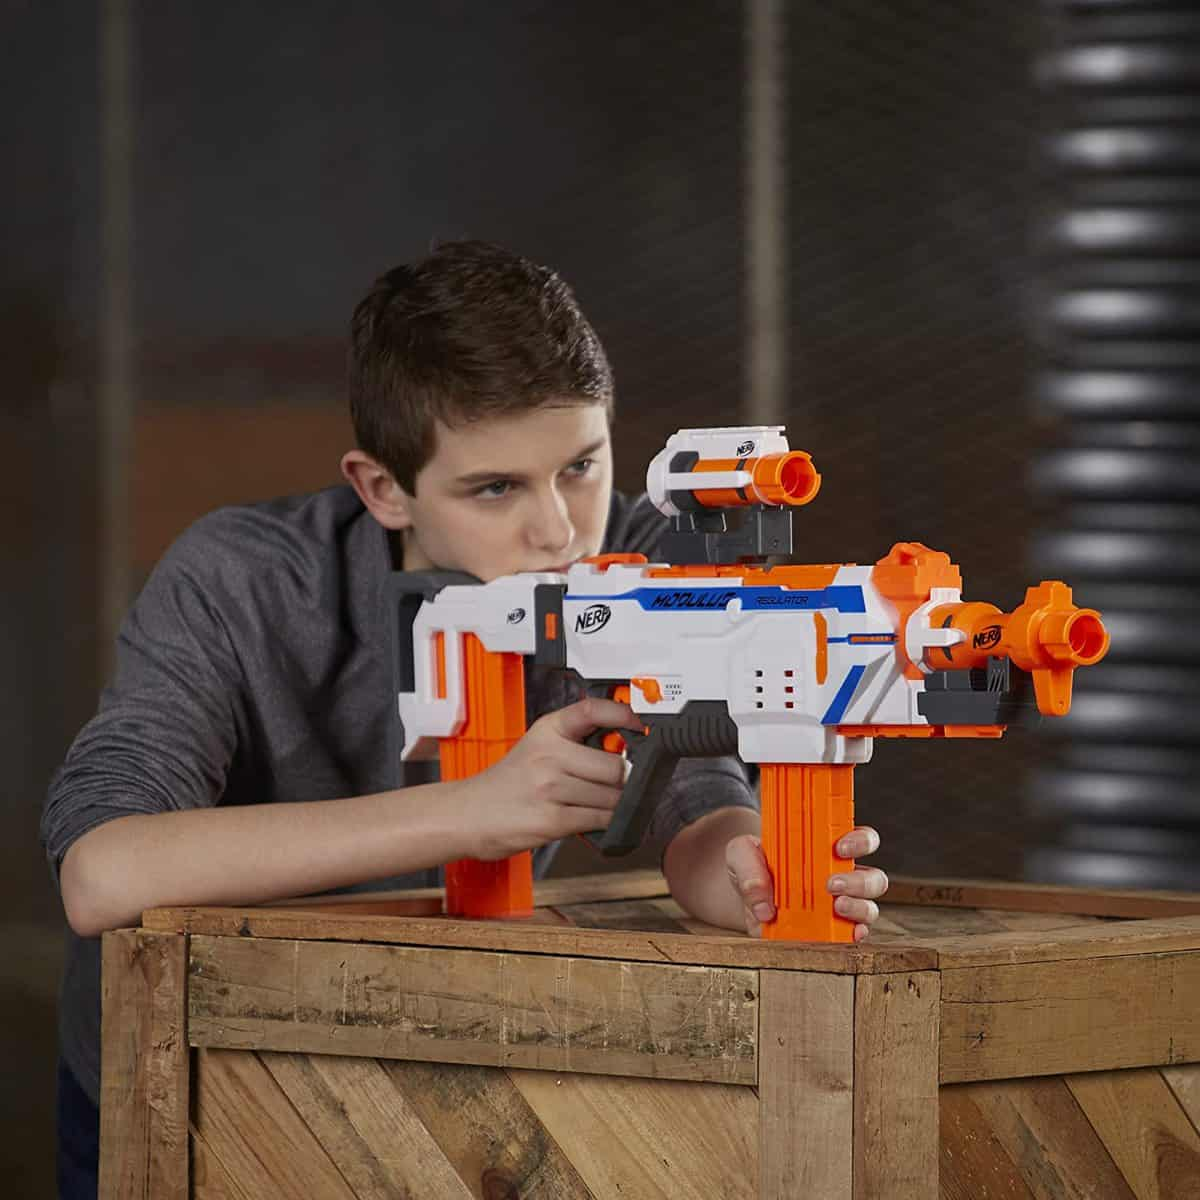 What is a NERF gun